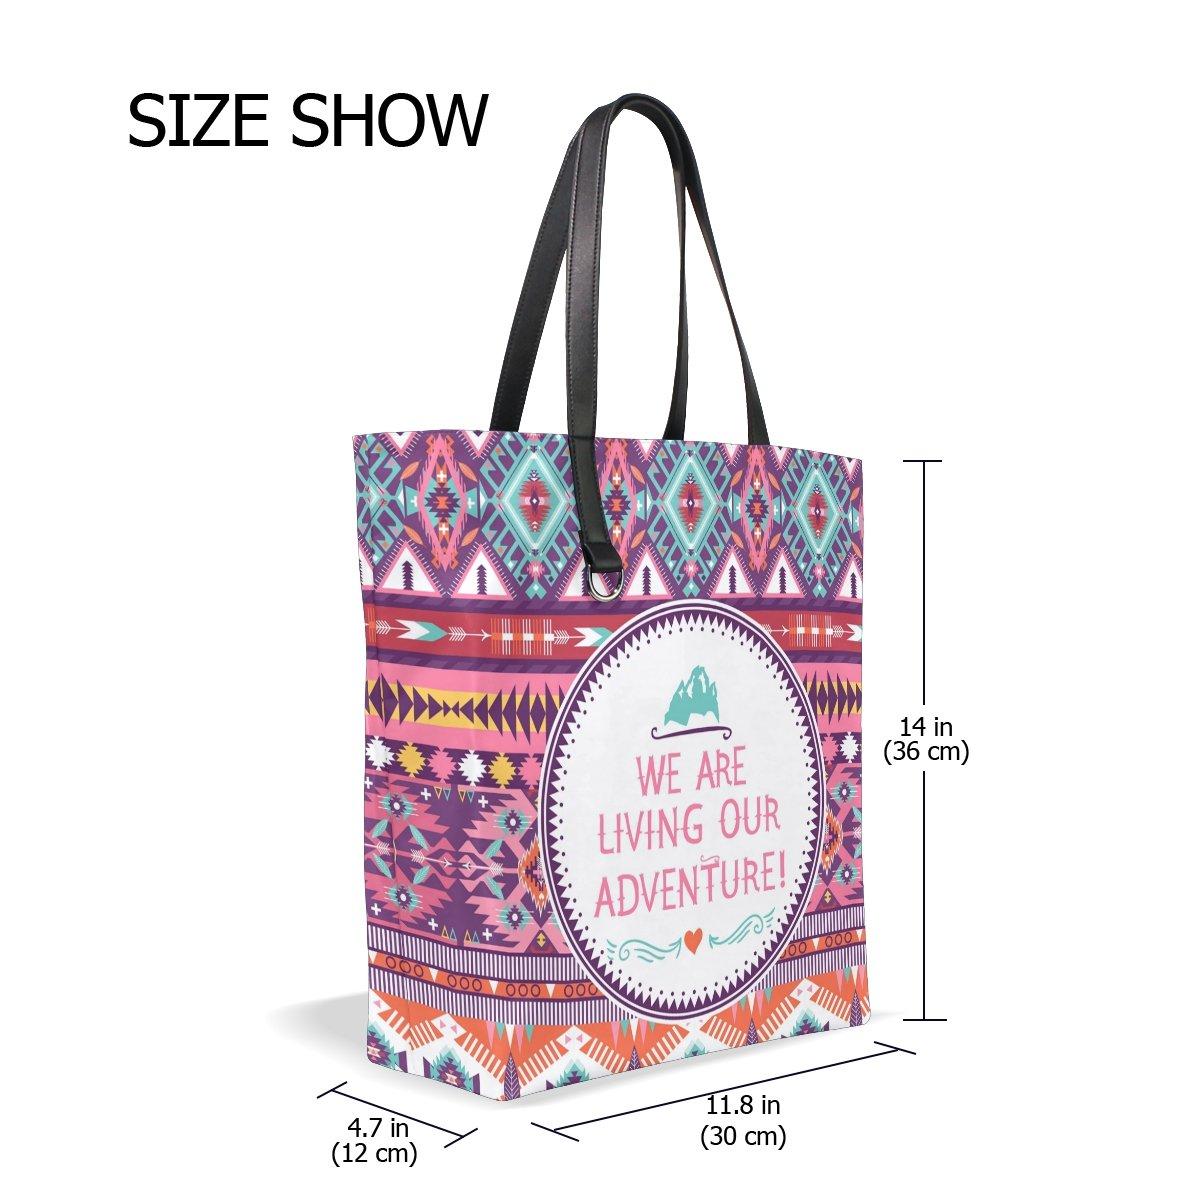 Handbags for Women Africa Art Culture Paisley Tote Shoulder Bag Satchel for Ladies Girls